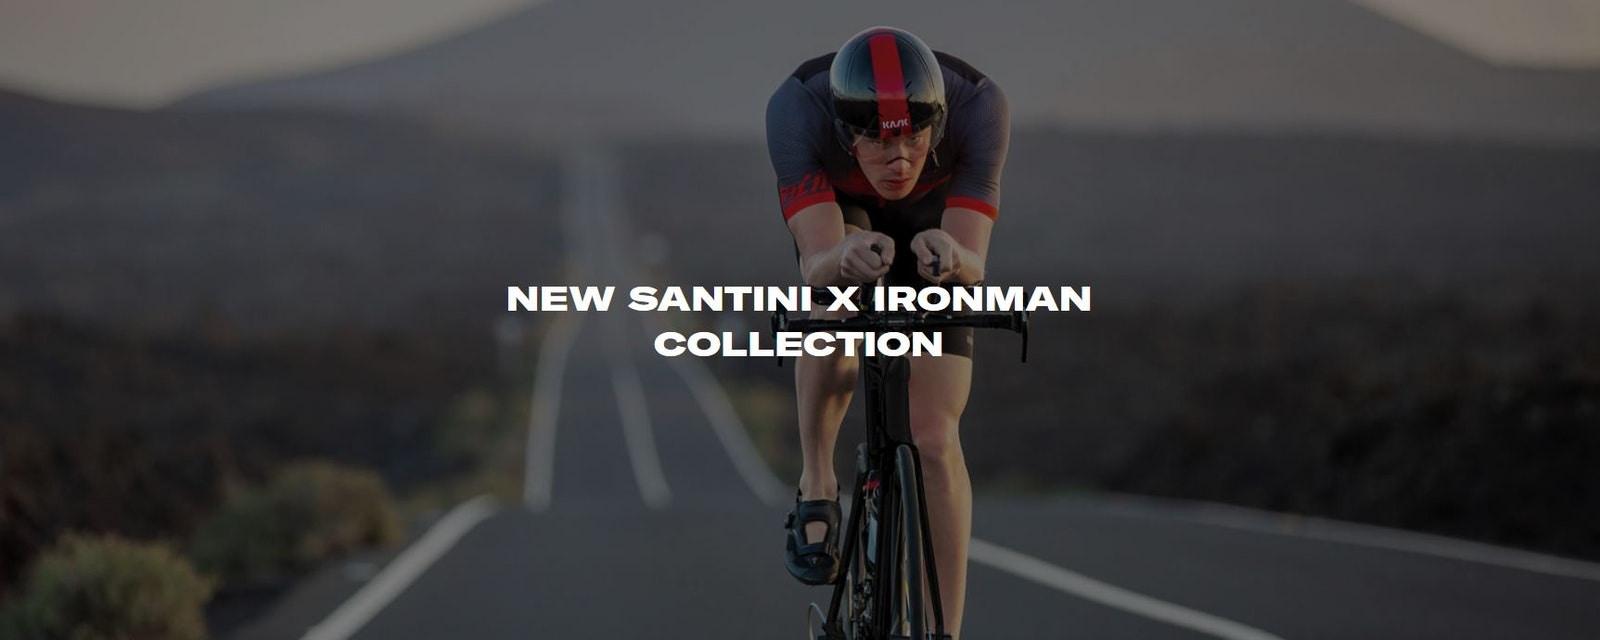 Santini - New Santini X IRONMAN Collection